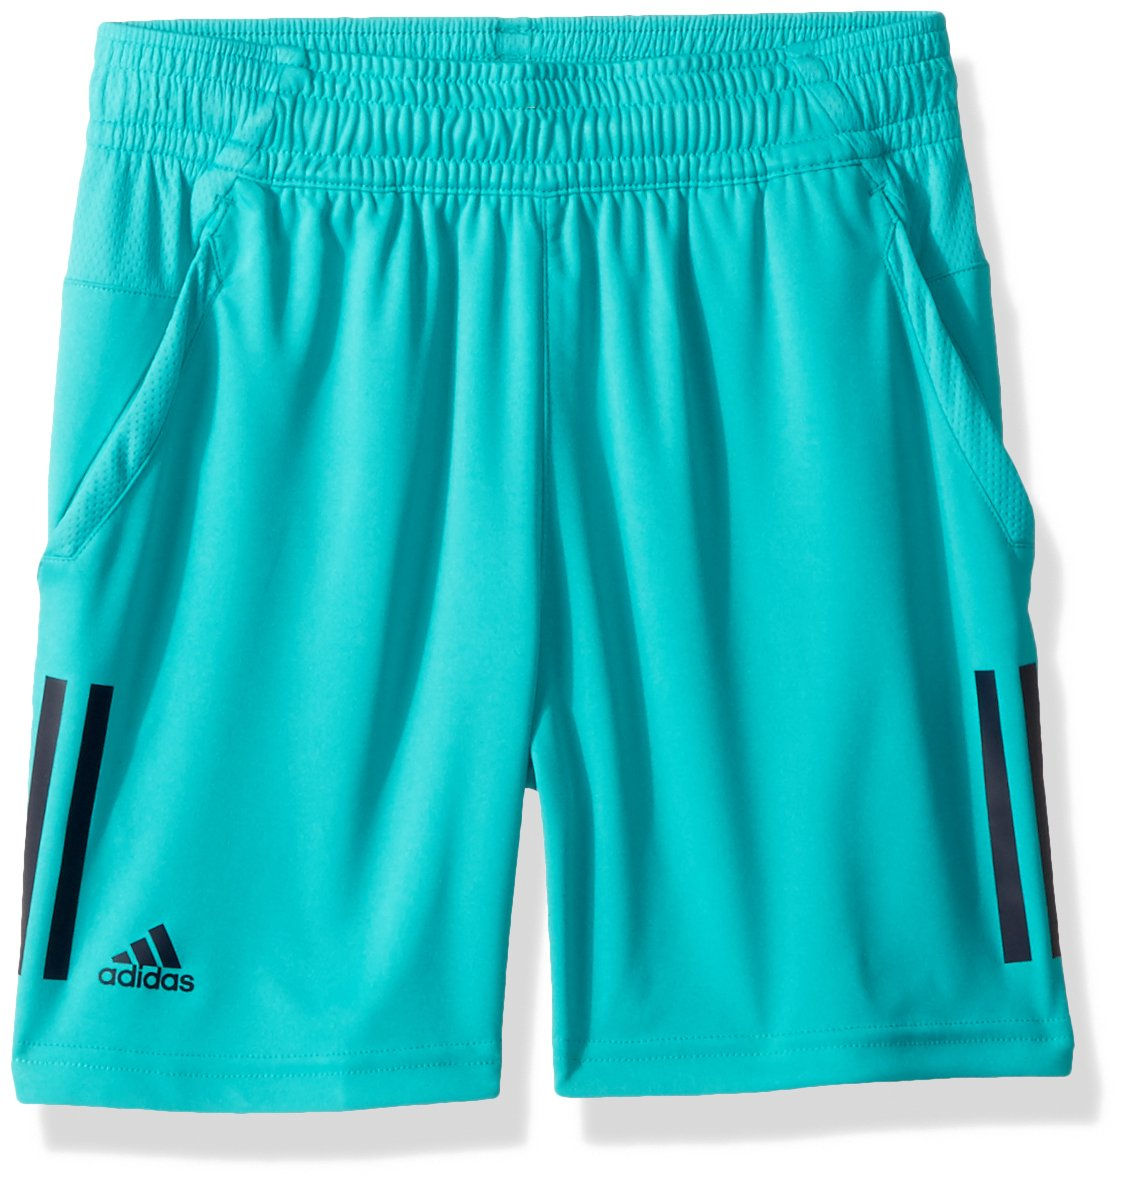 Adidasテニス3ストライプClub Shorts B077Y55GKF Hi-Res Aqua Small